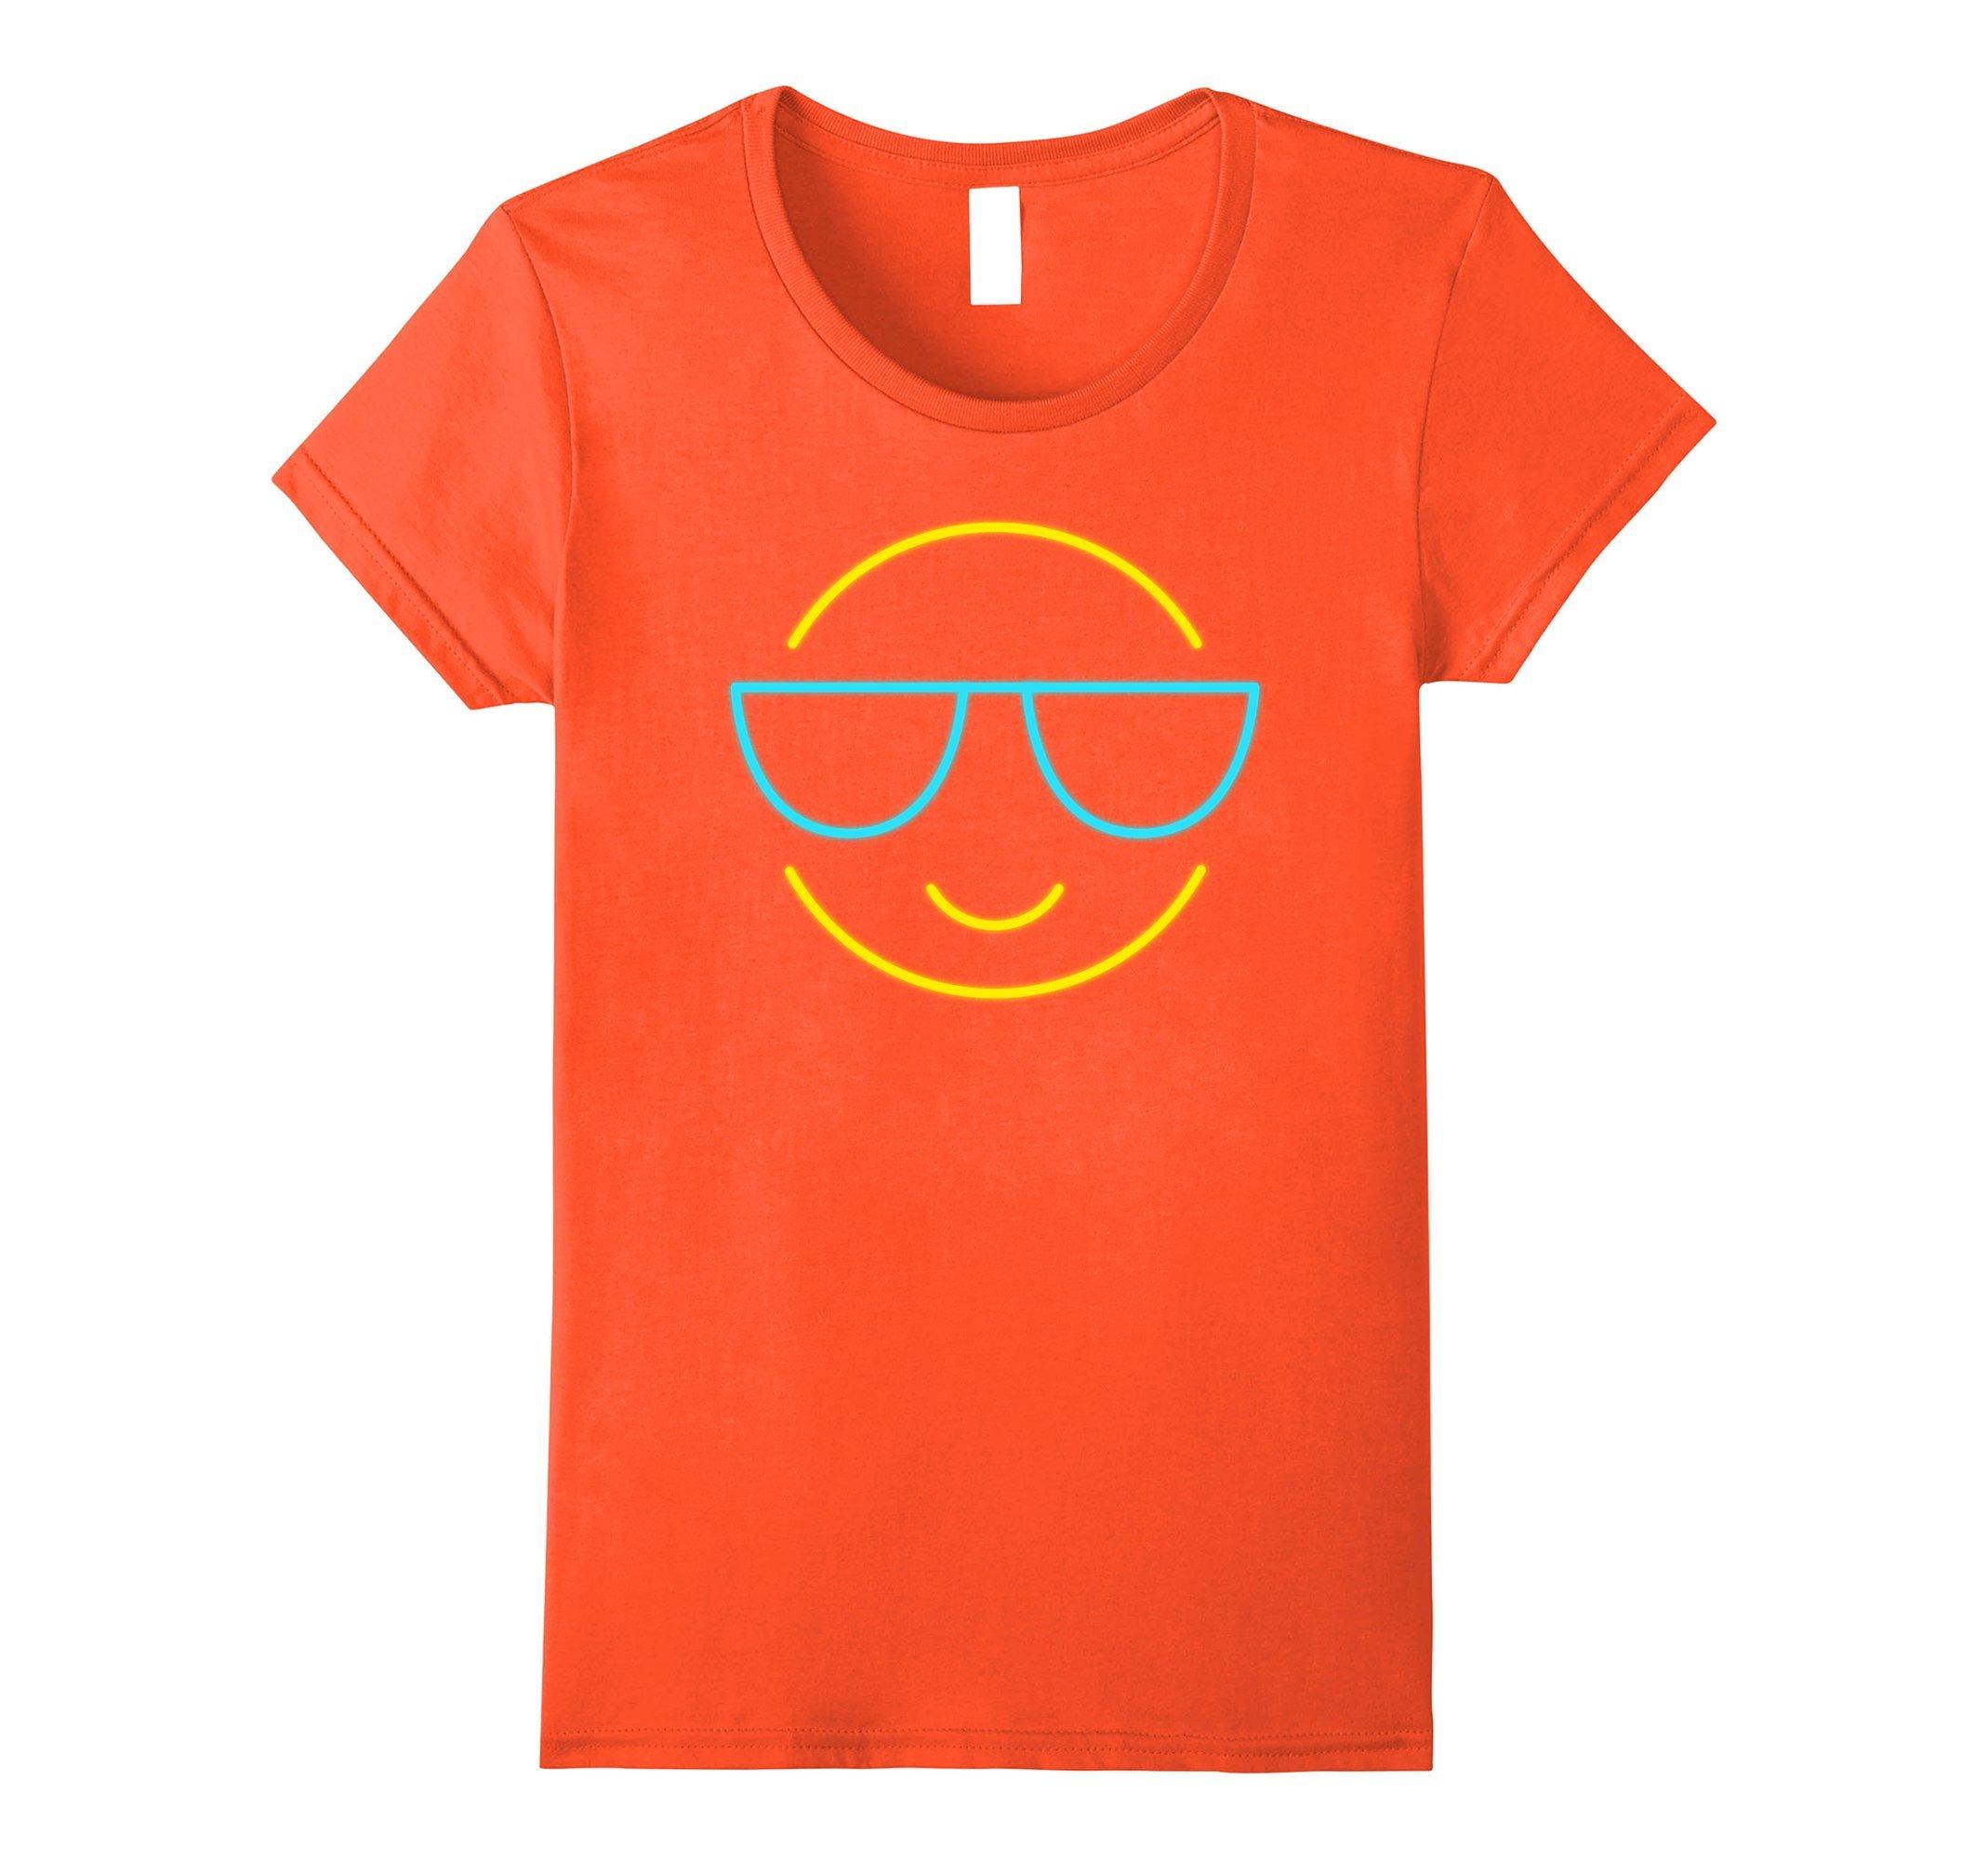 Womens 80s Retro Neon Sign Aloha Emoji T-Shirt. 80's Gift Small Orange